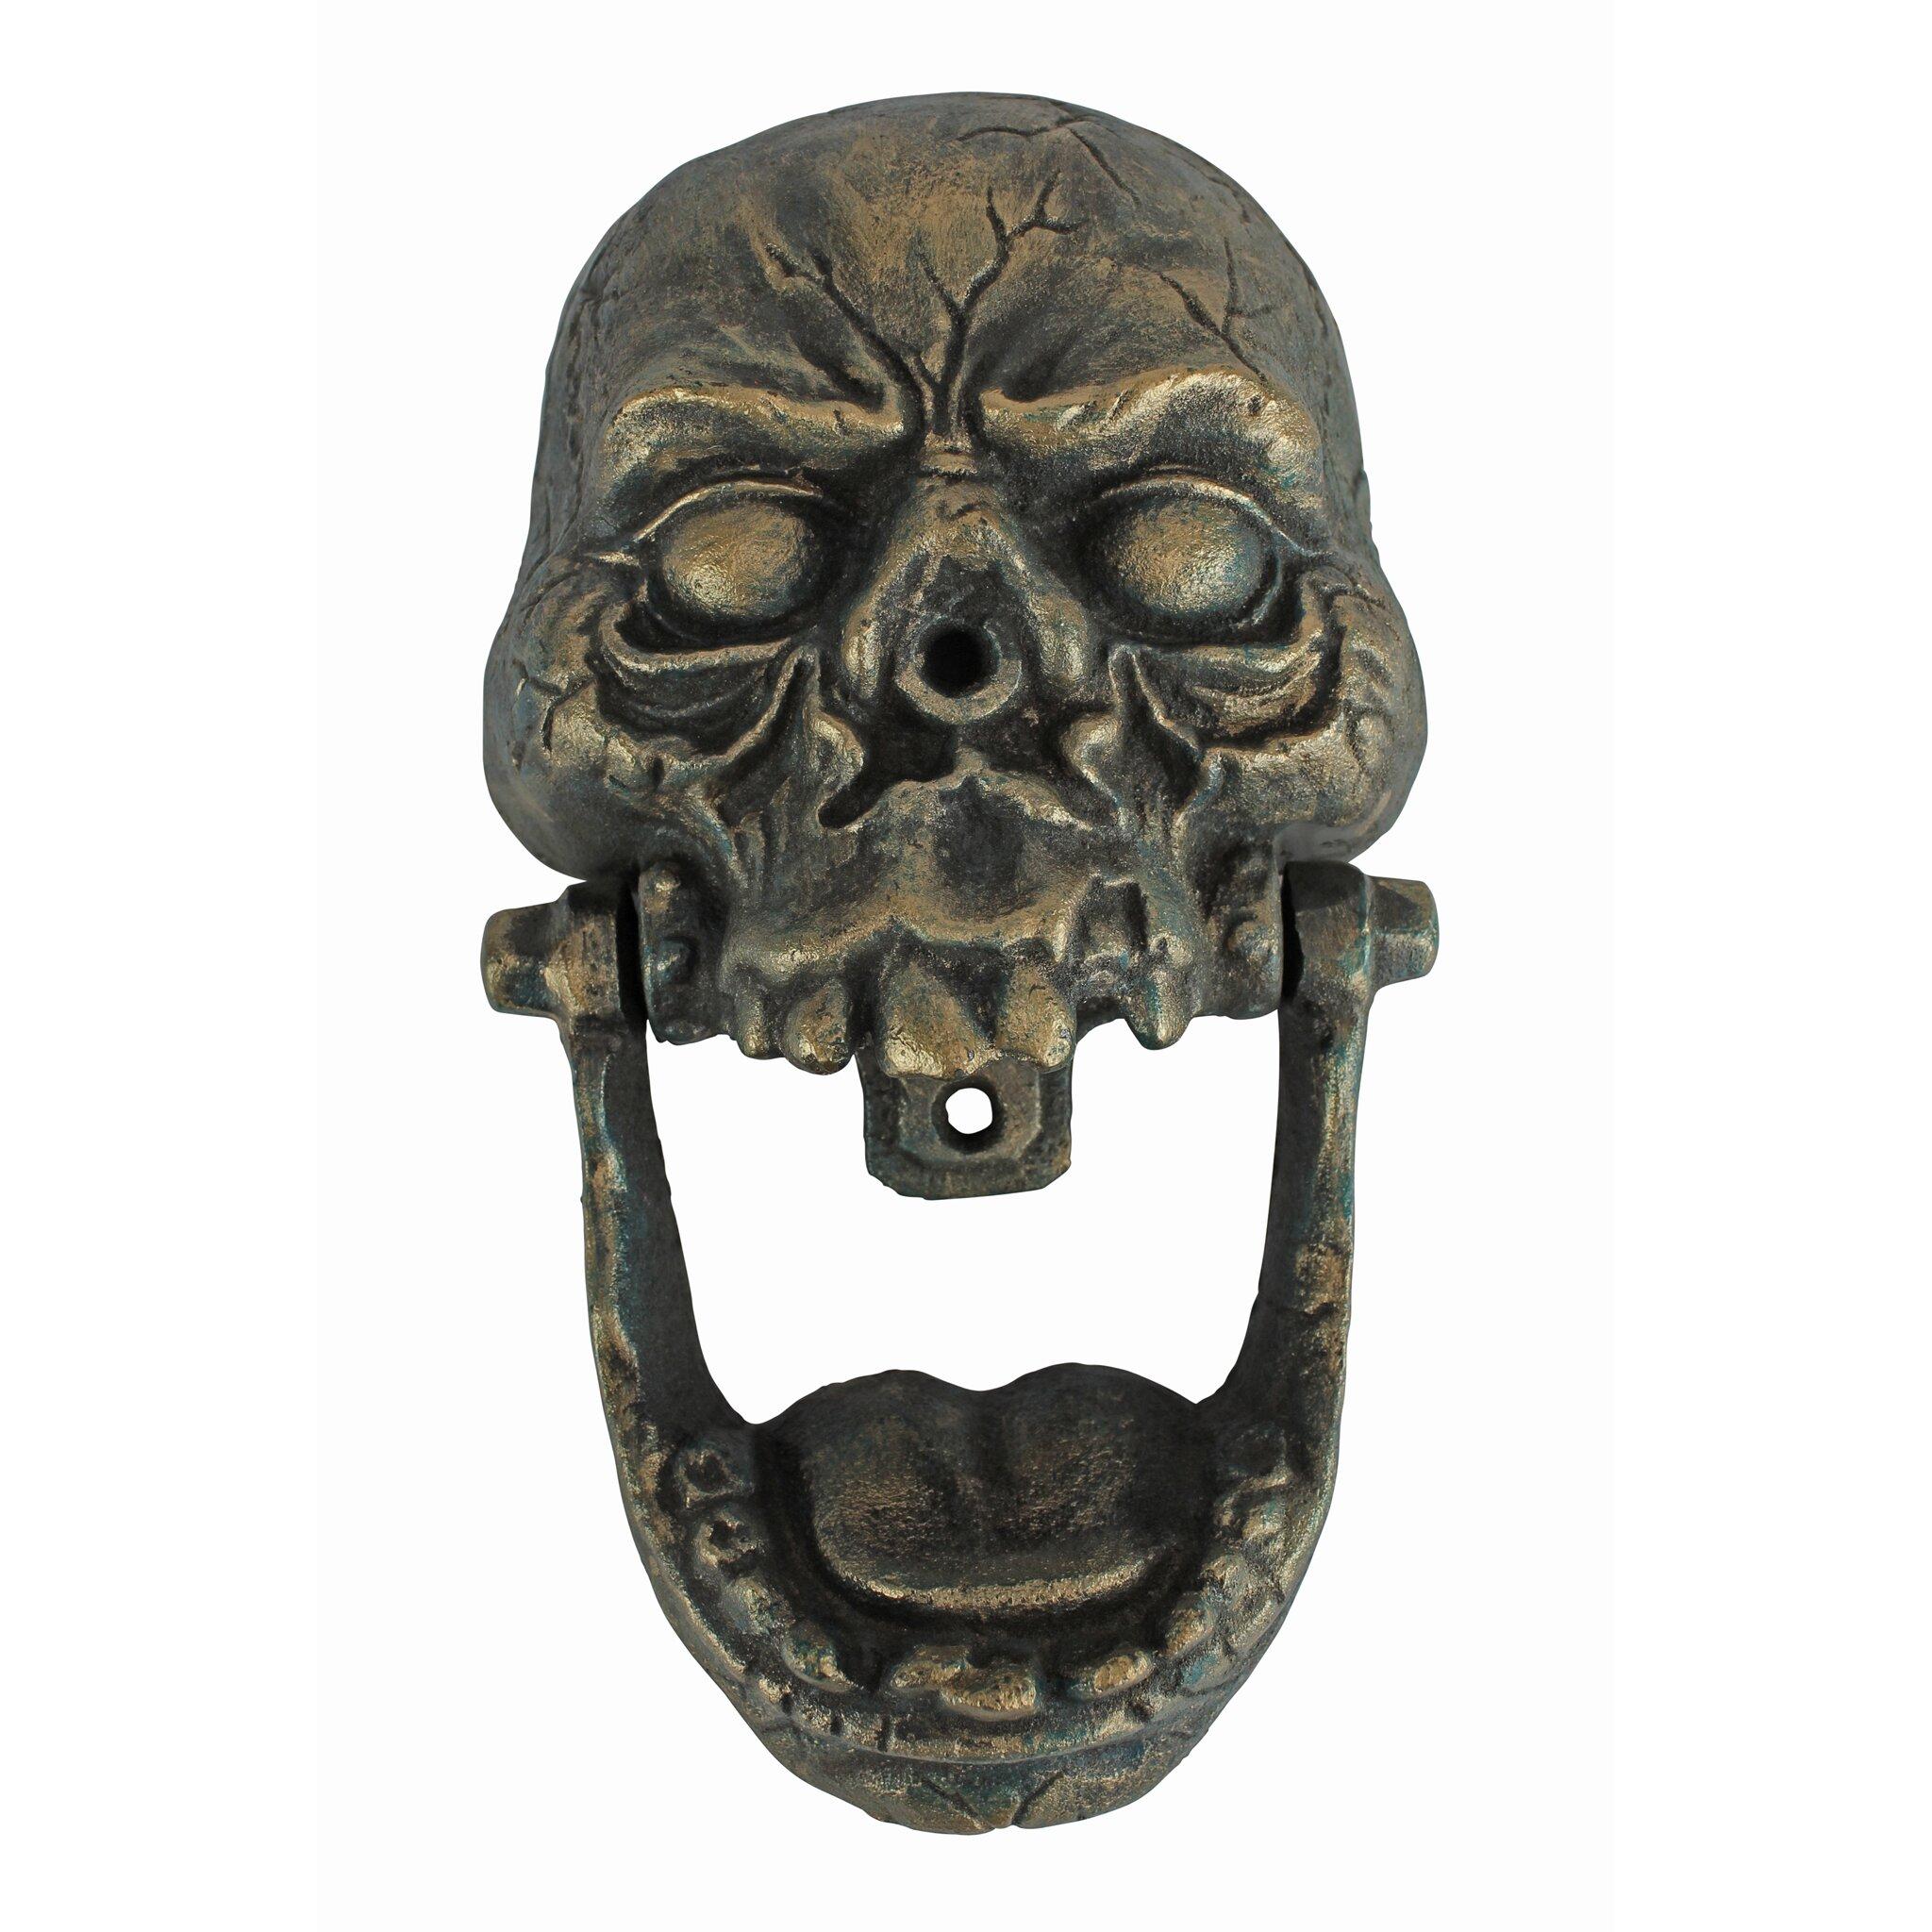 Design Toscano Knock Jaw Skull Cast Iron Door Knocker  : Design Toscano Knock Jaw Skull Cast Iron Door Knocker SP2716 from www.wayfair.com size 2048 x 2048 jpeg 582kB